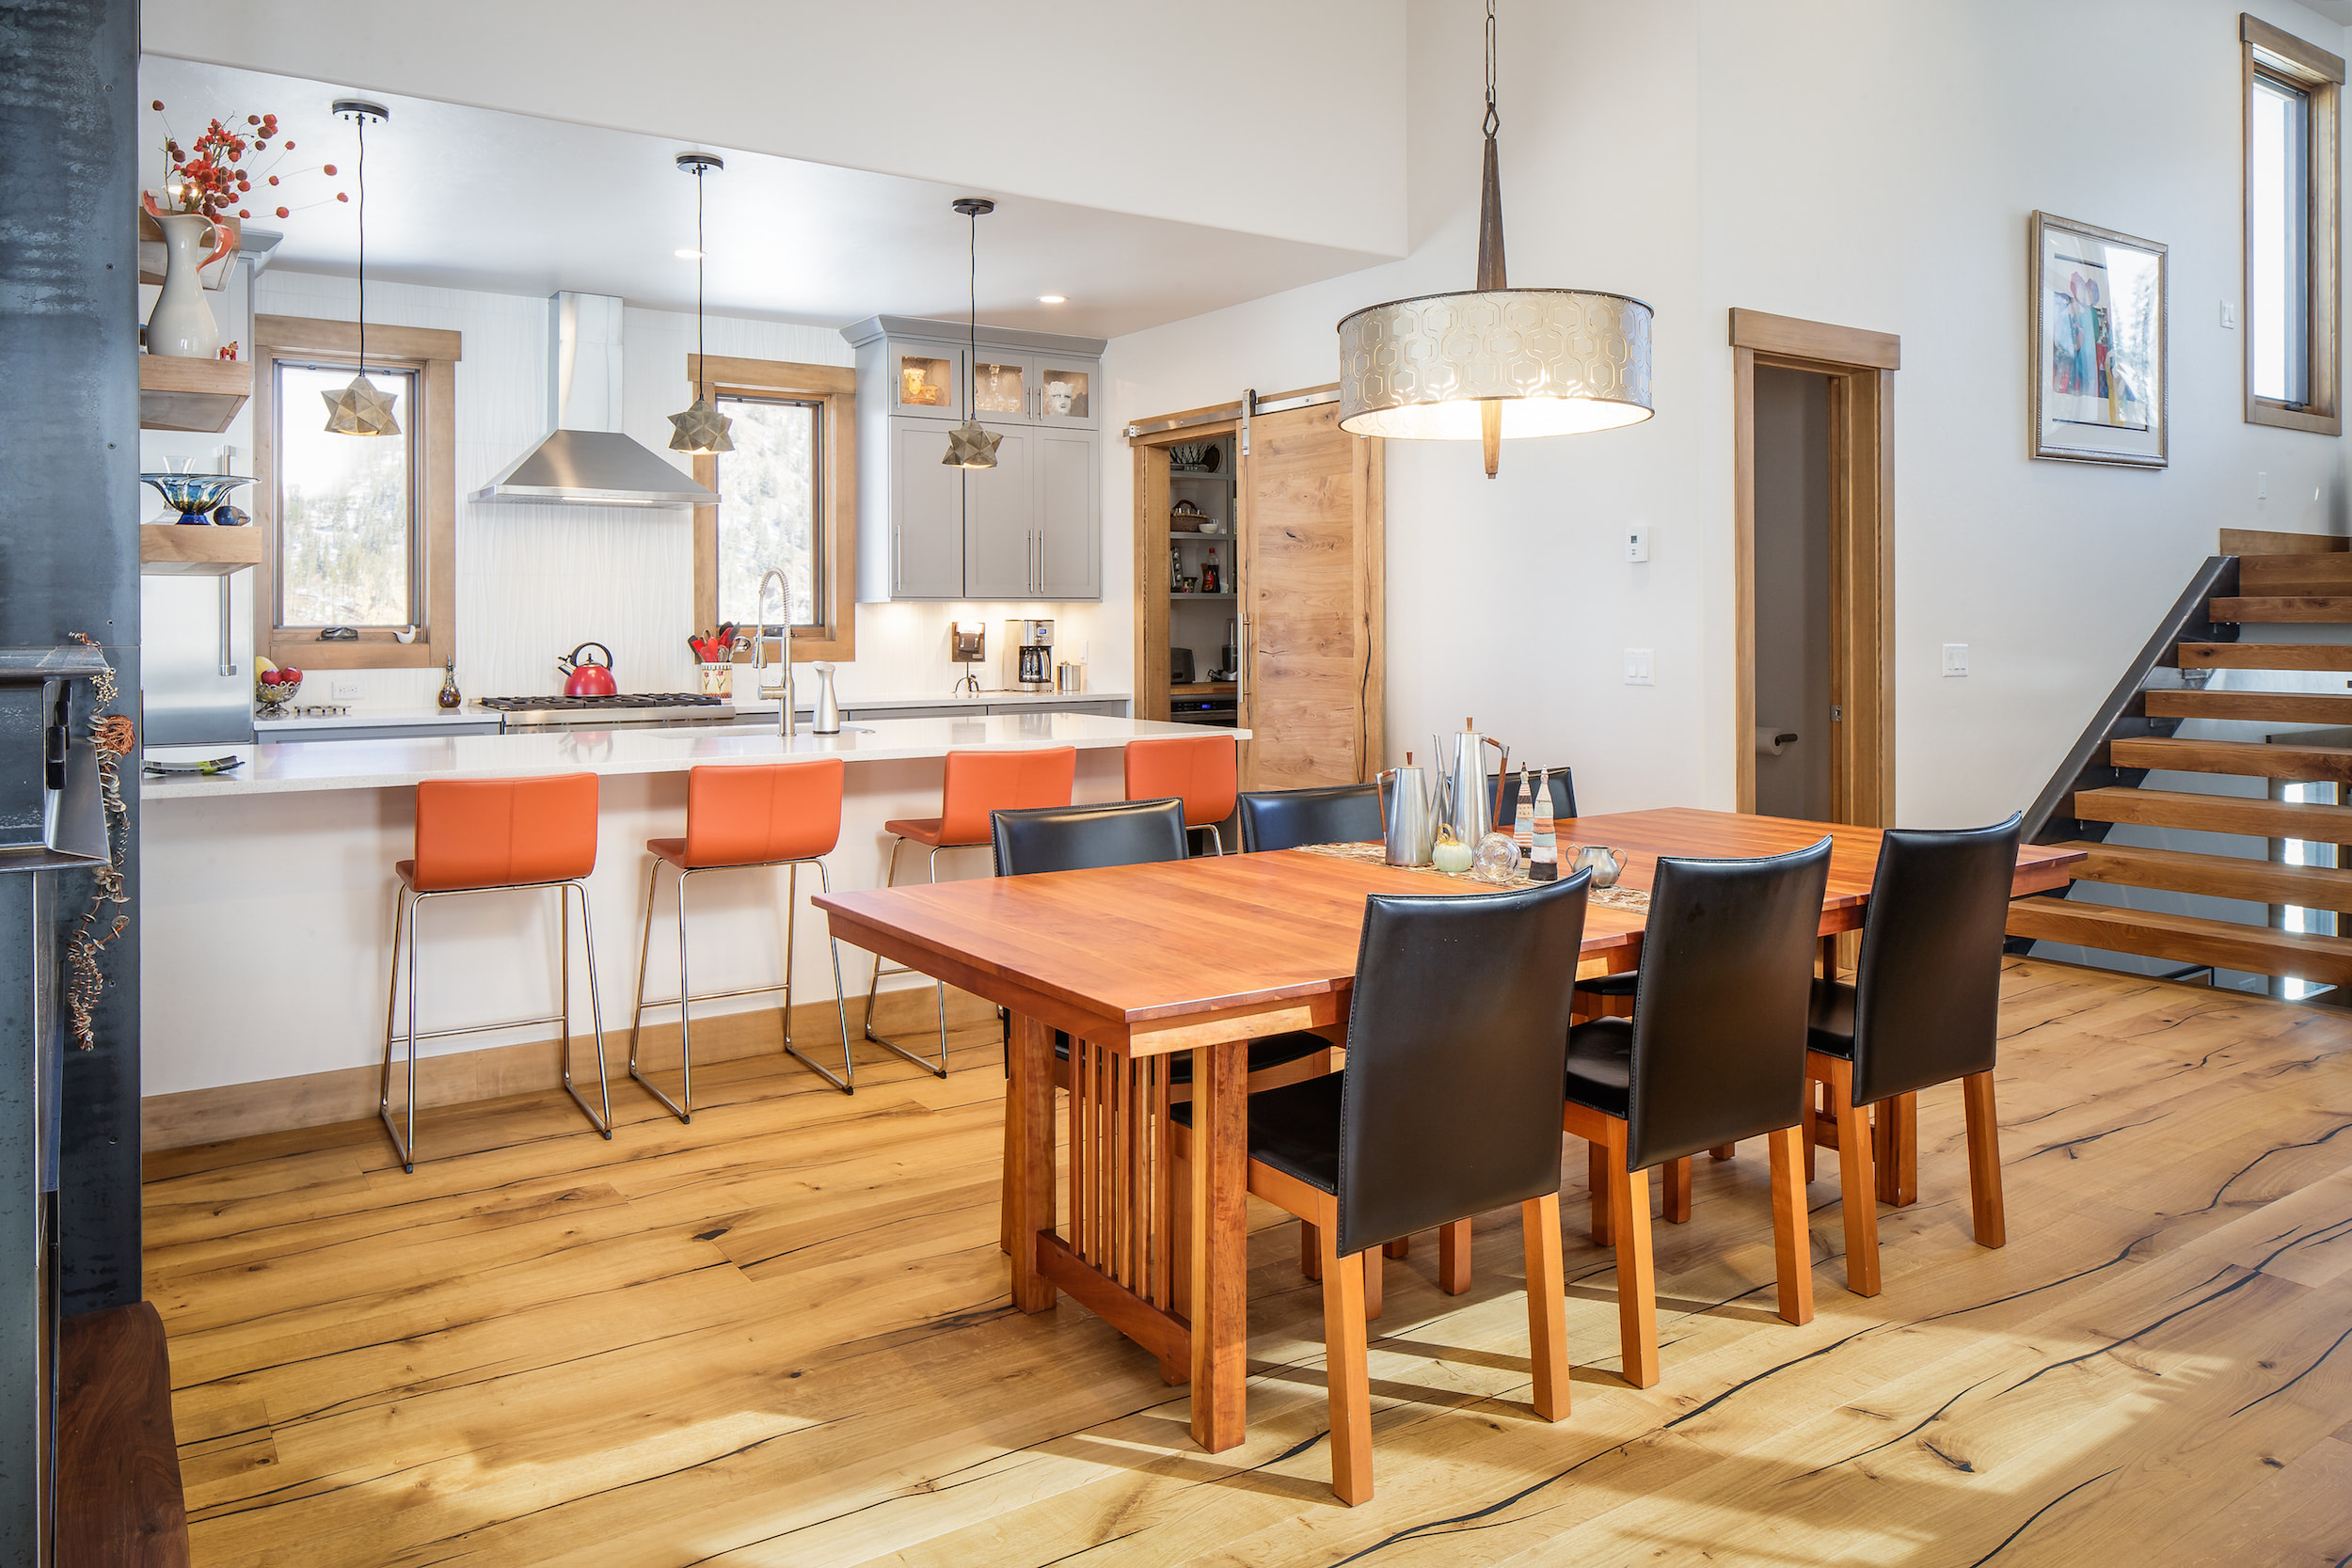 Breckenridge Highlands Dining and Kitchen